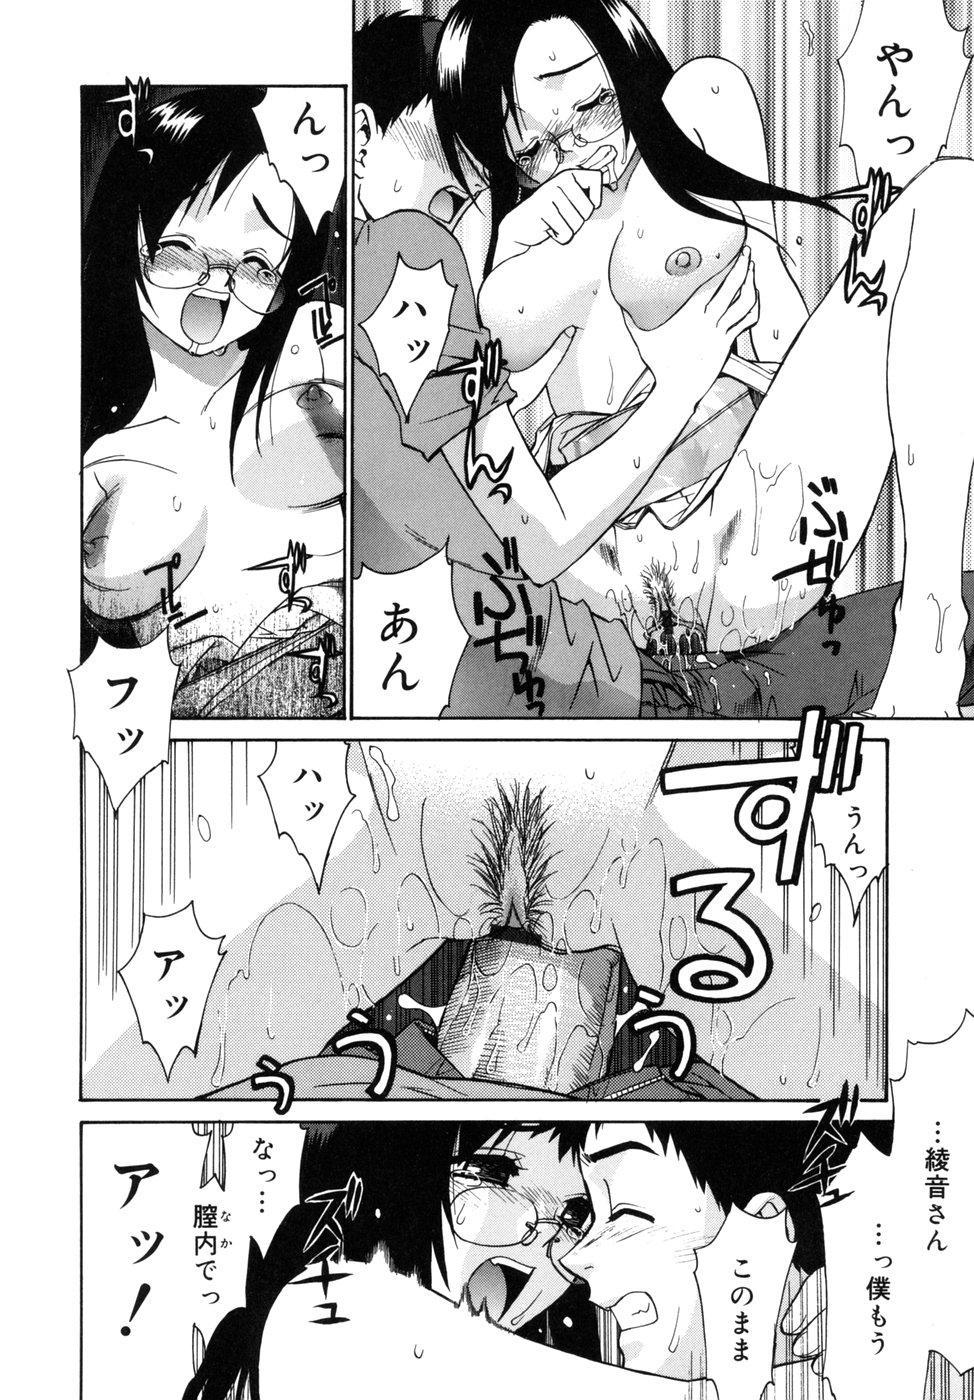 [Yaya Hinata] Tonari no Miko-san wa Minna Warau - The next shrine maidens smile in everyone. 39